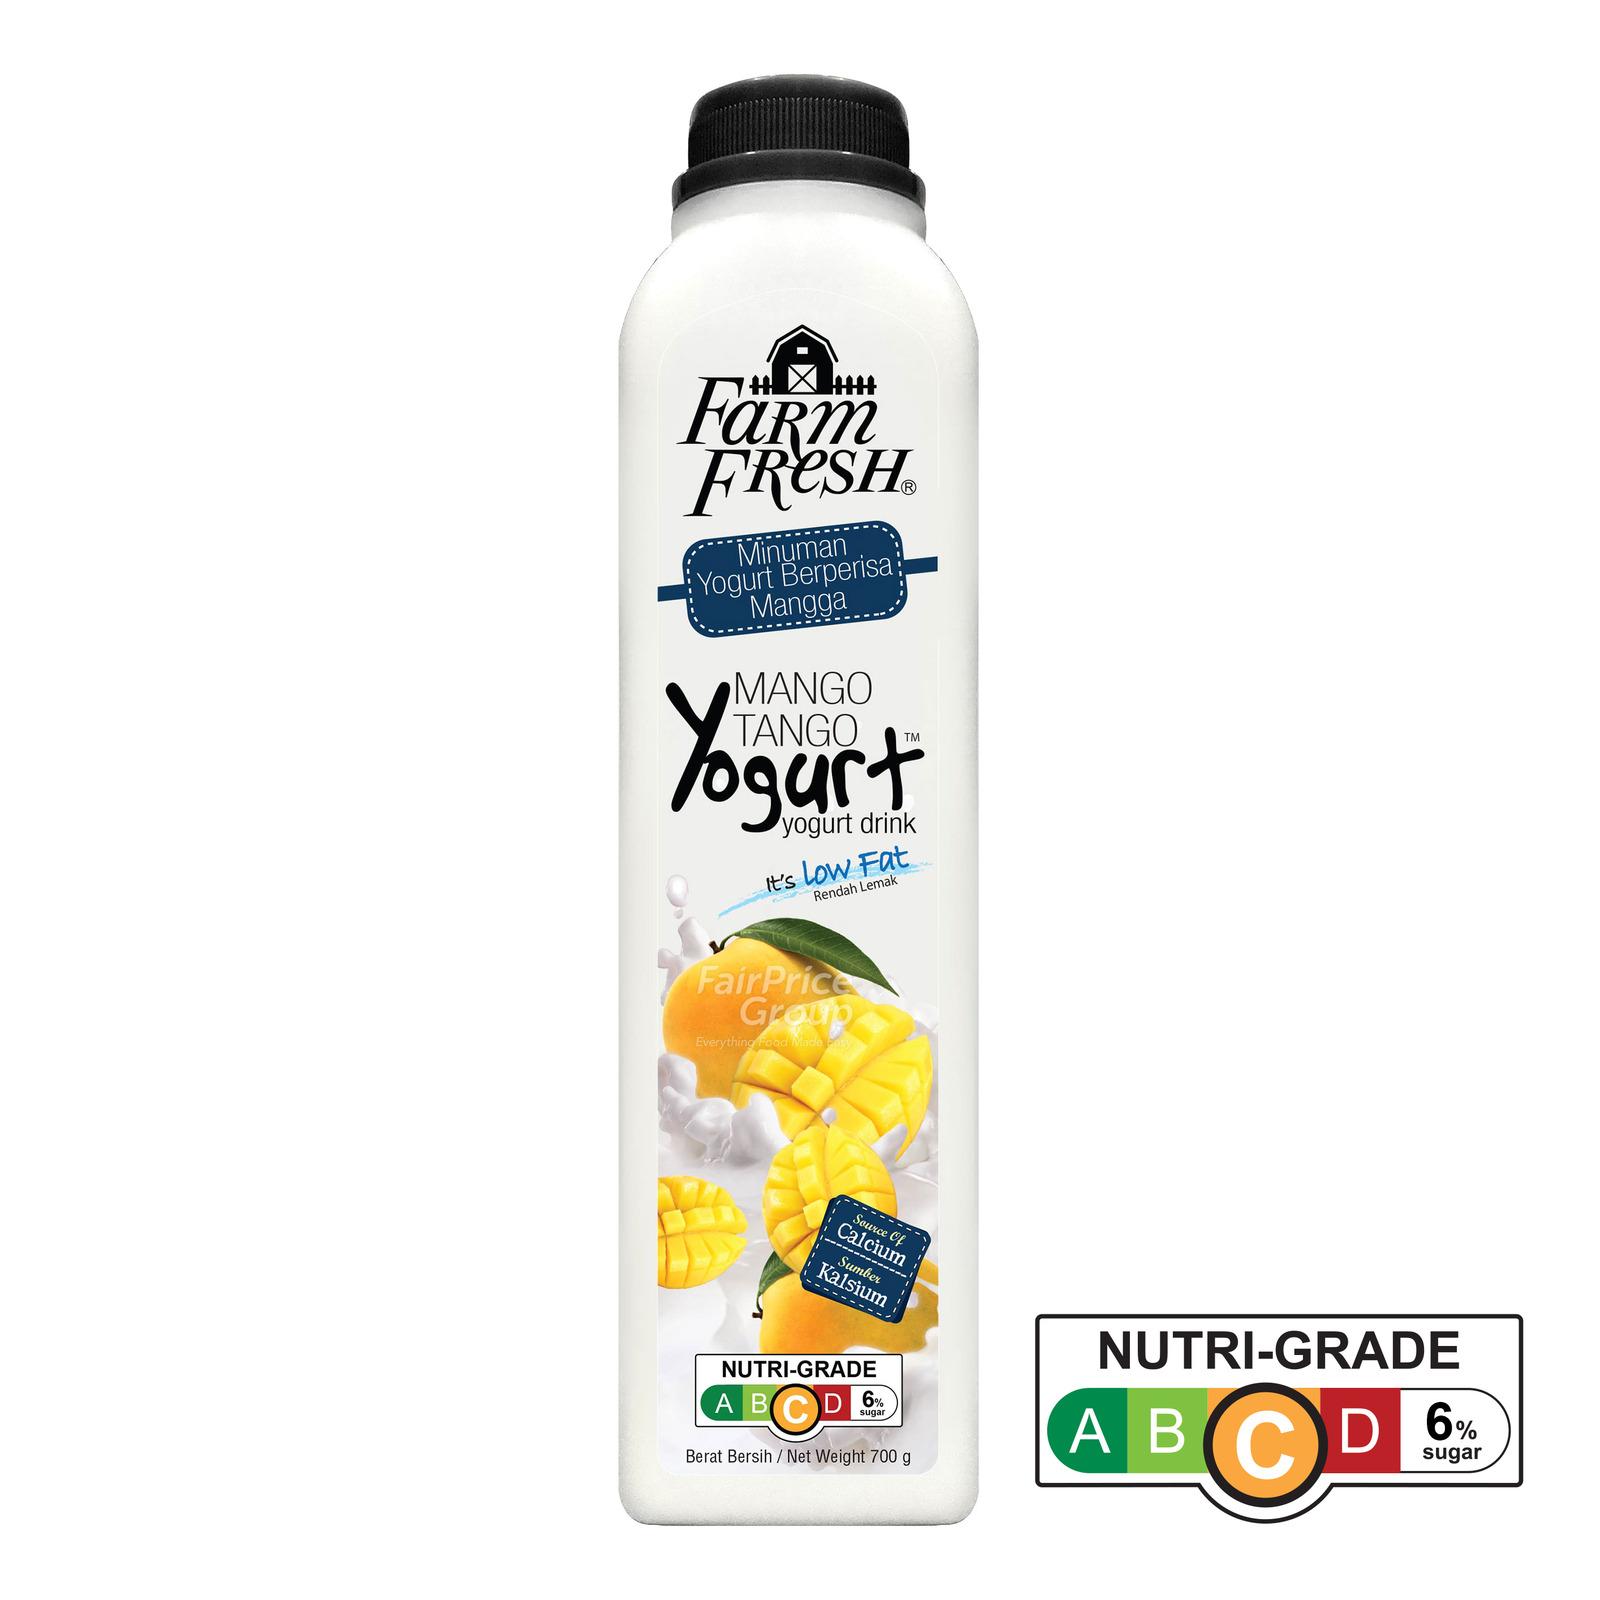 Farm Fresh Yogurt Bottle Drink - Mango Tango